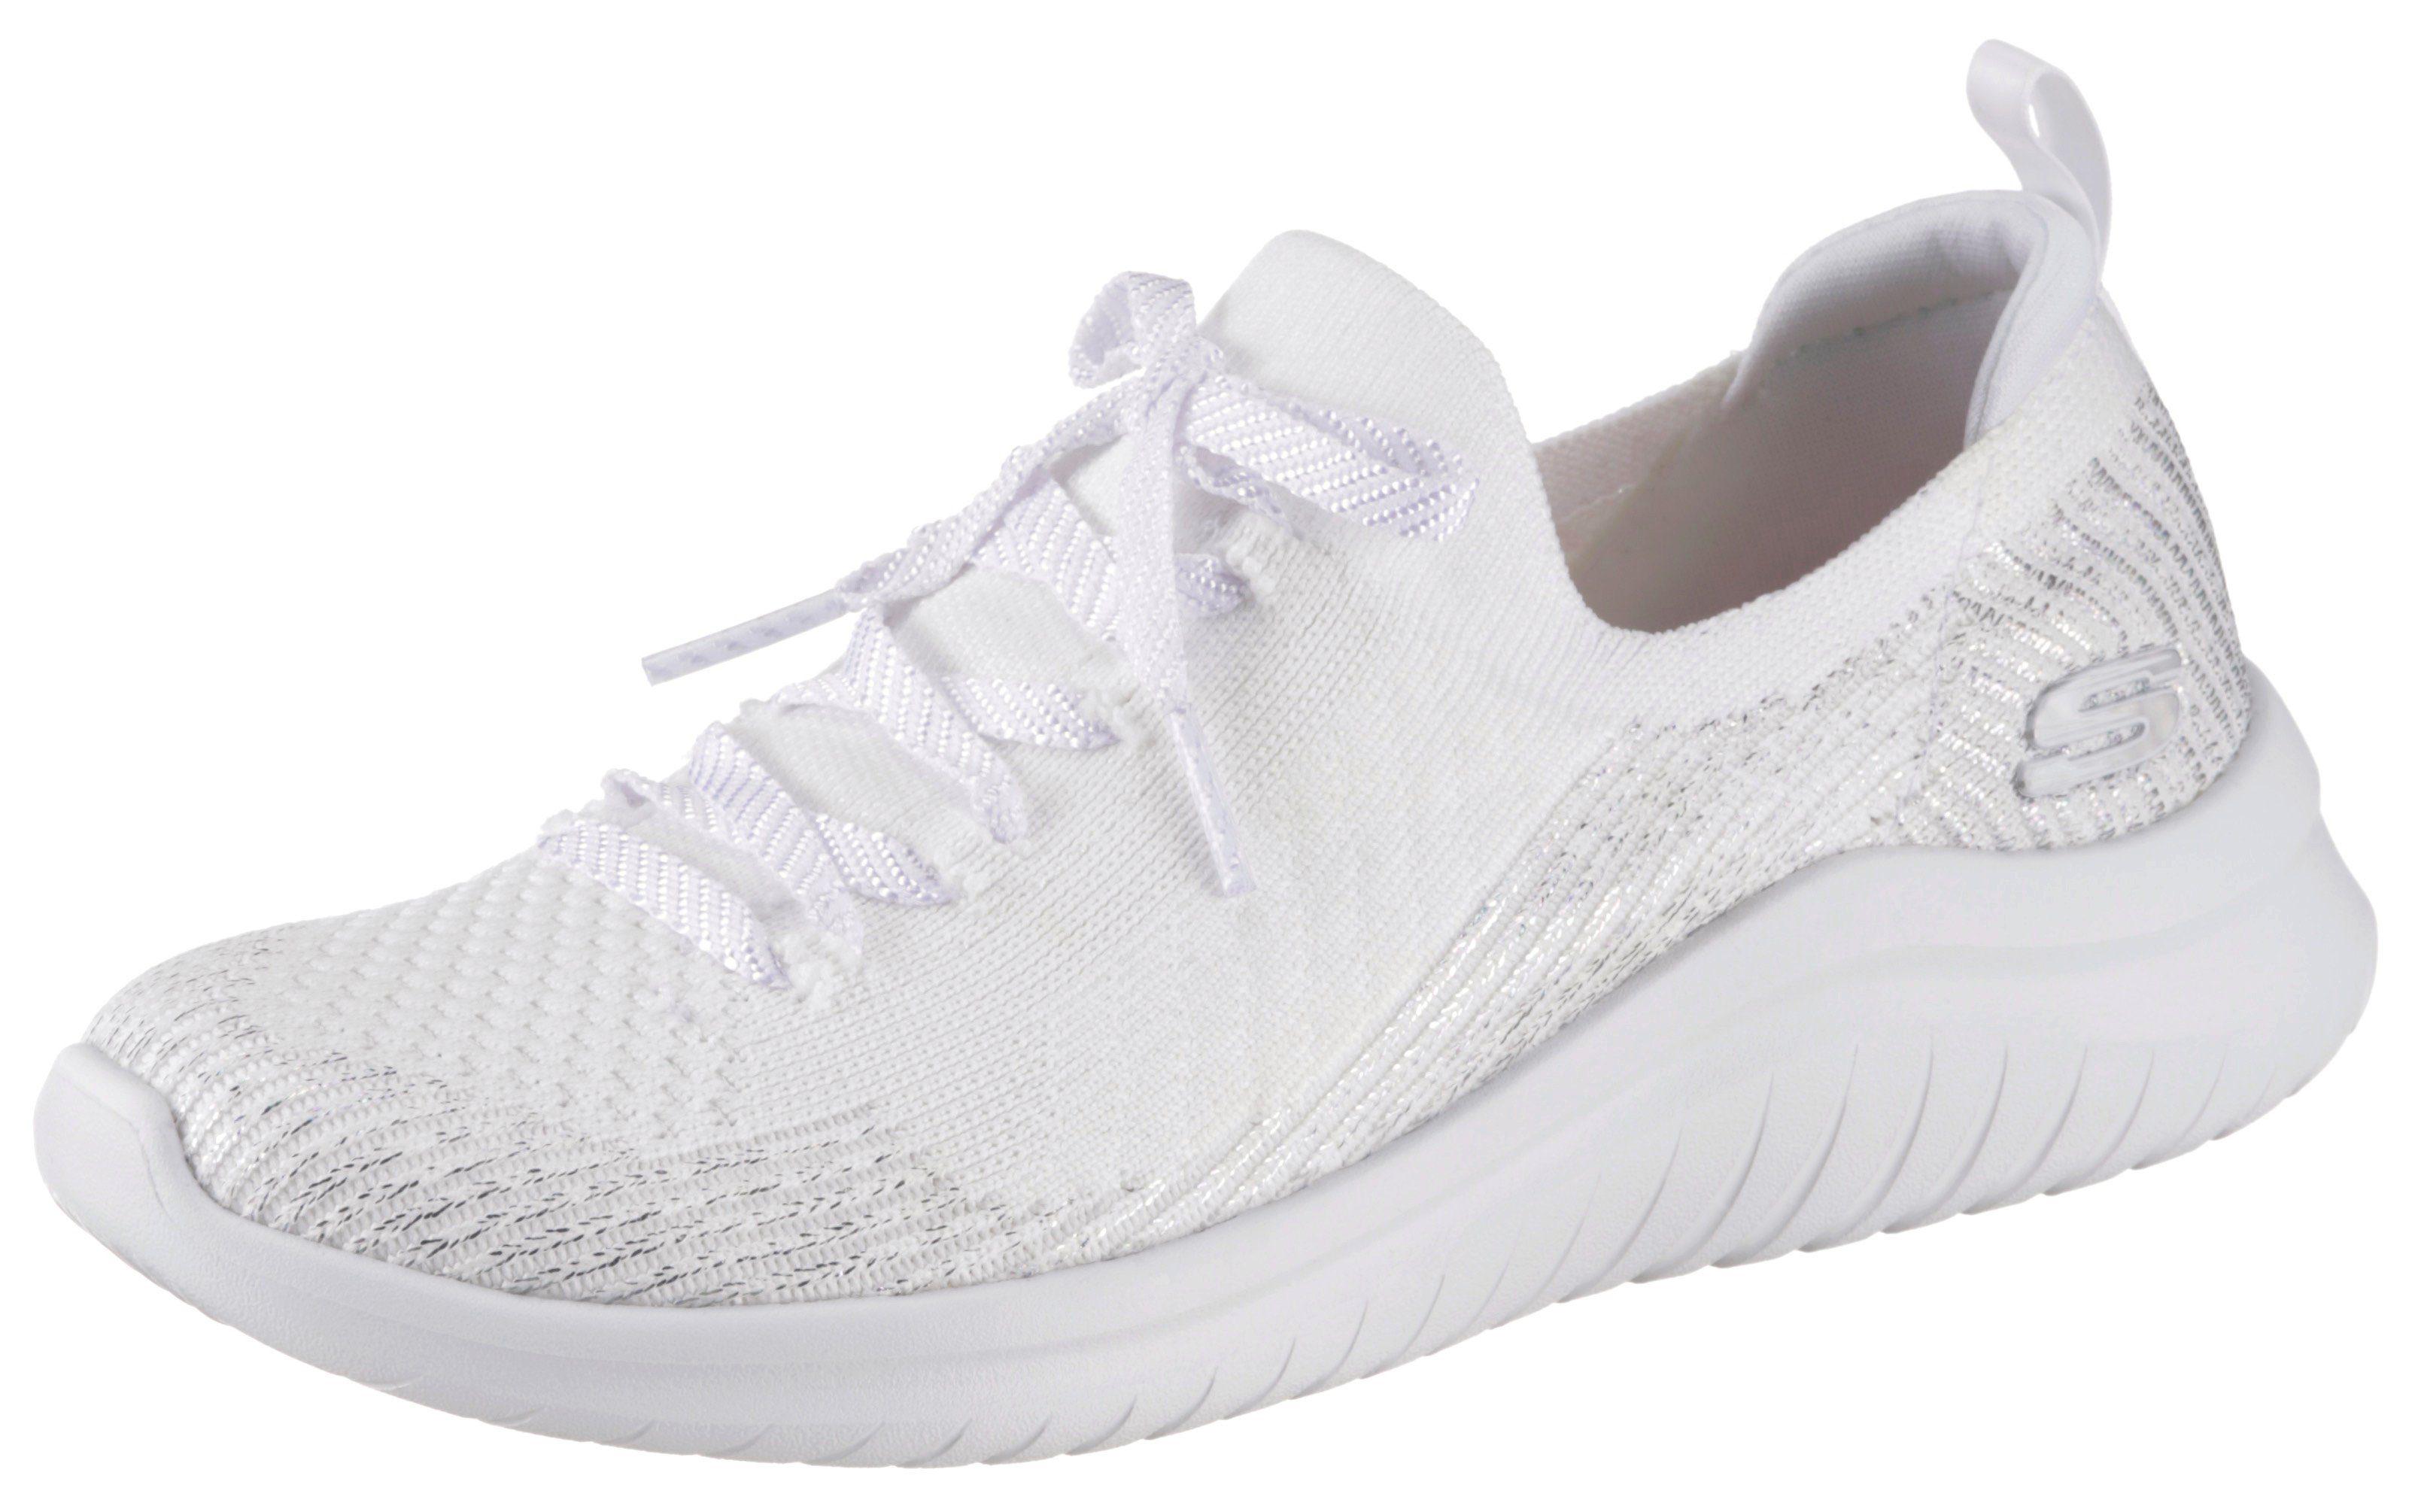 Skechers »Ultra Flex 2.0« Slip On Sneaker mit Metallic tCOxz